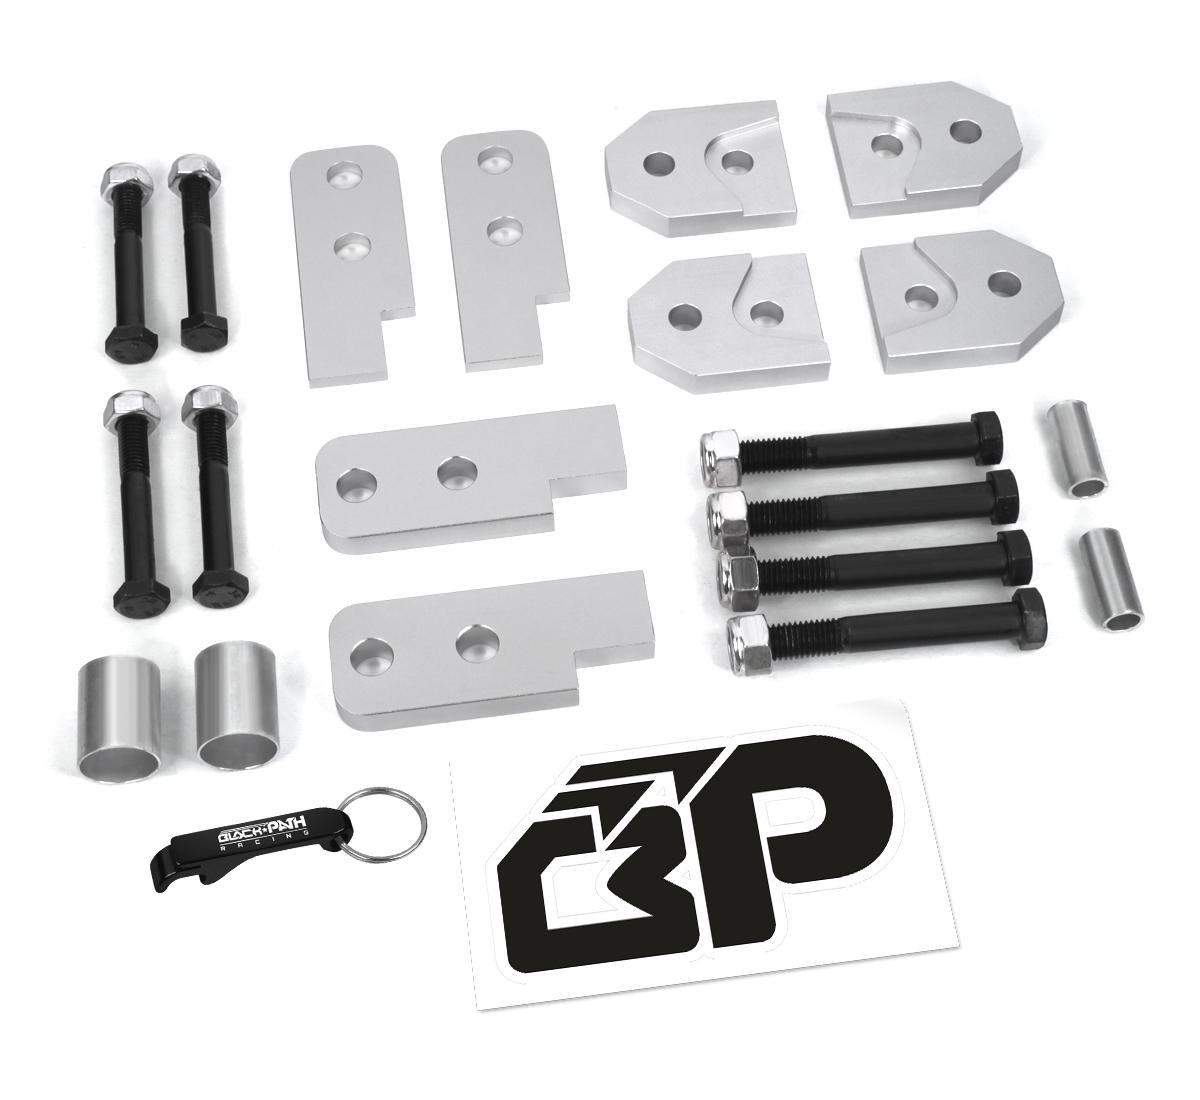 Black Path - Yamaha Rhino 450 660 700 2'' Full Lift Kit SE Sport Silver Billet Kit